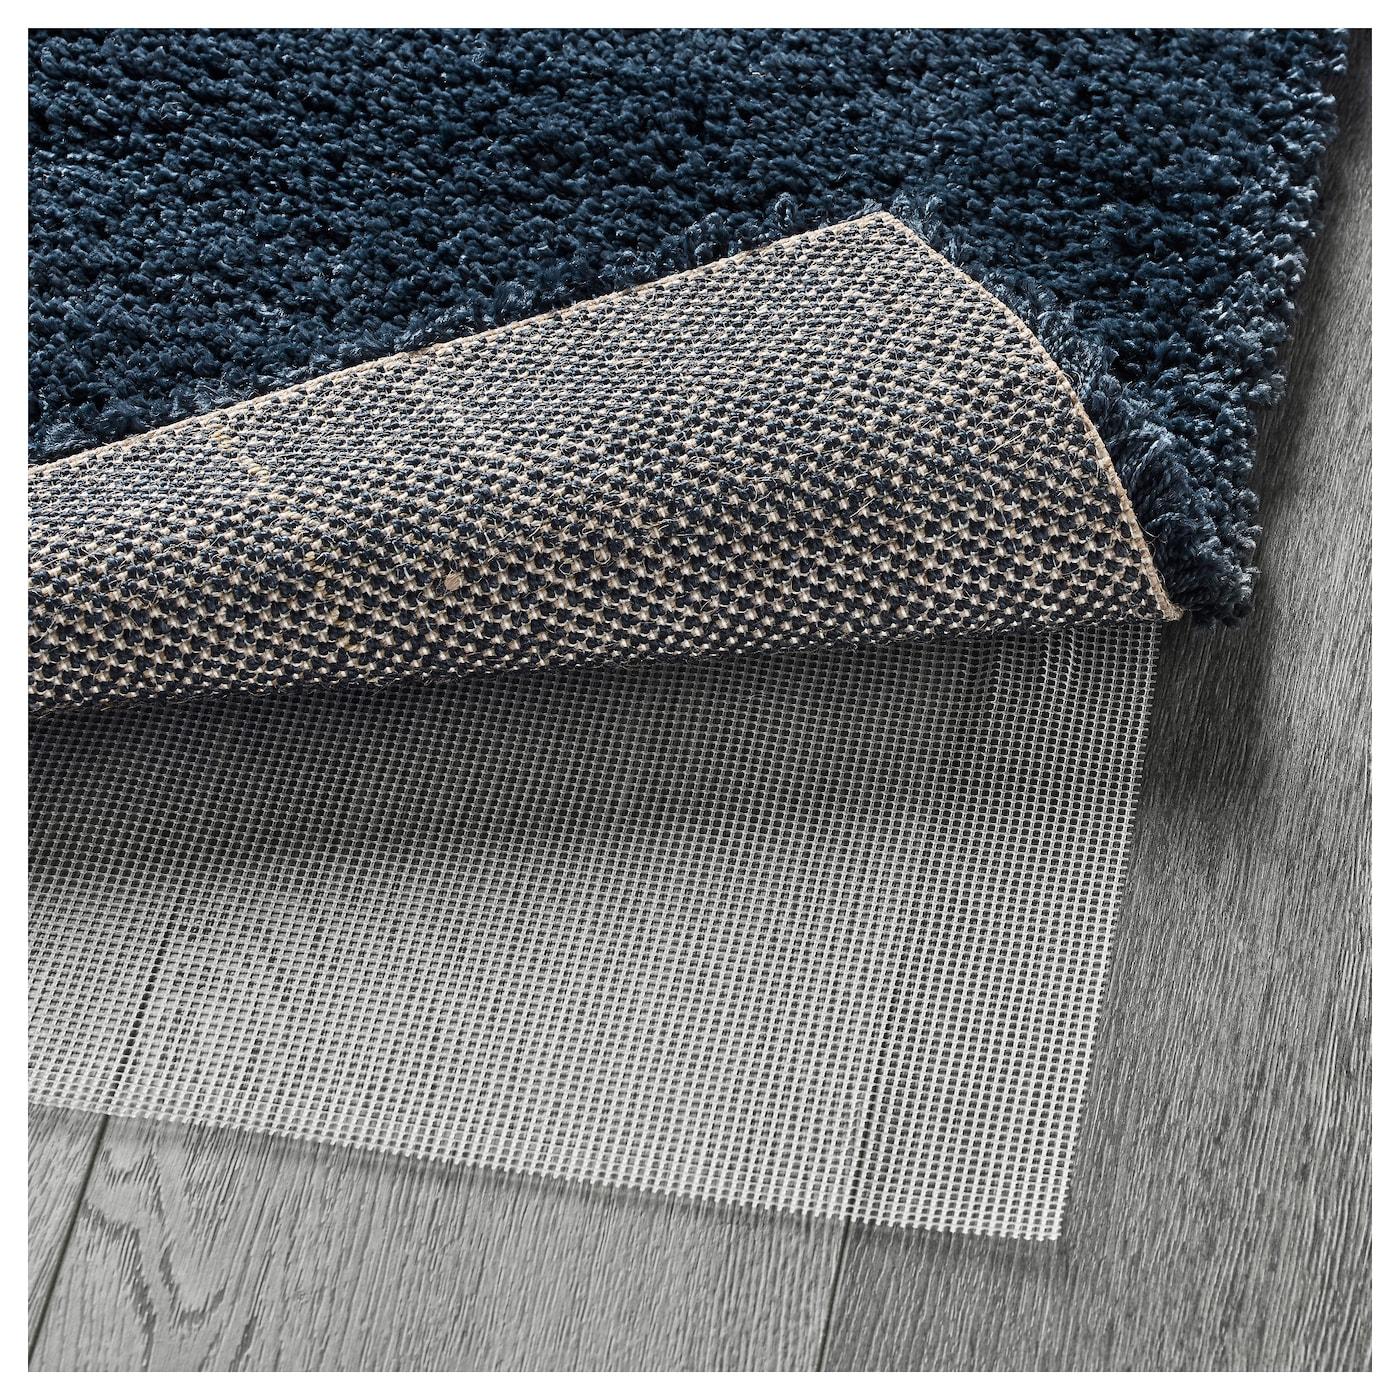 dum vloerkleed hoogpolig donkerblauw 170x240 cm ikea. Black Bedroom Furniture Sets. Home Design Ideas